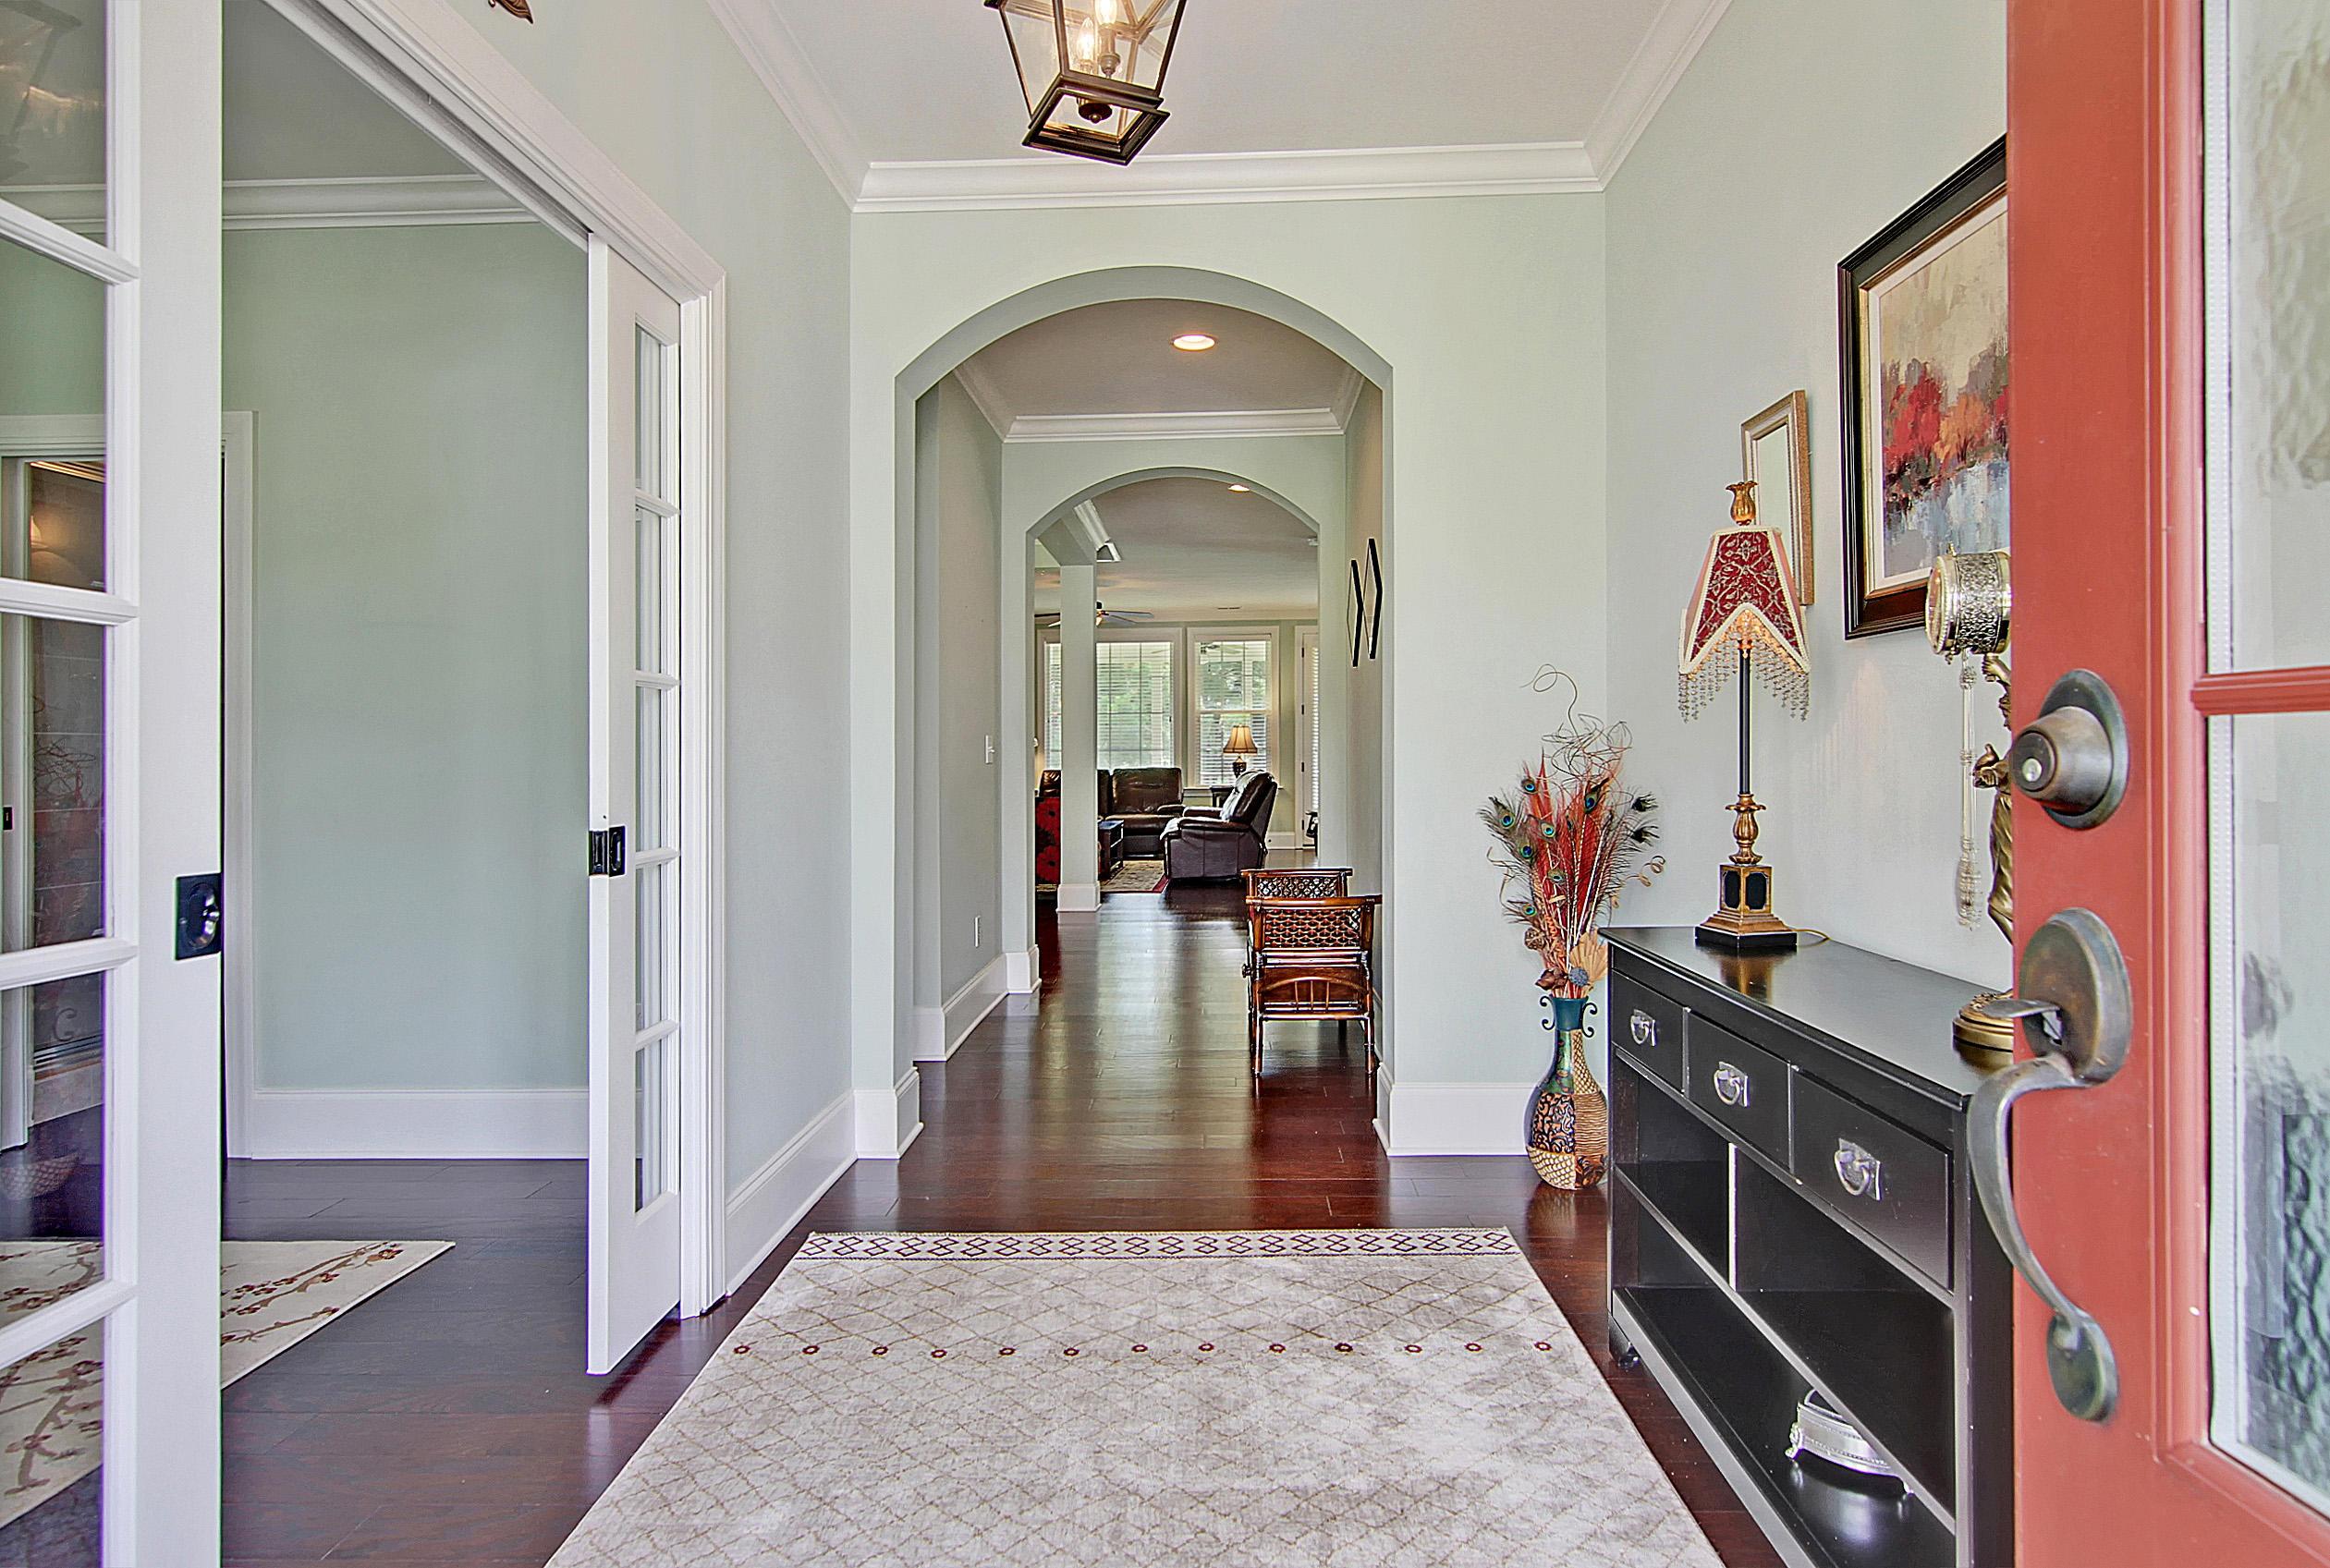 Dunes West Homes For Sale - 1332 Whisker Pole, Mount Pleasant, SC - 8